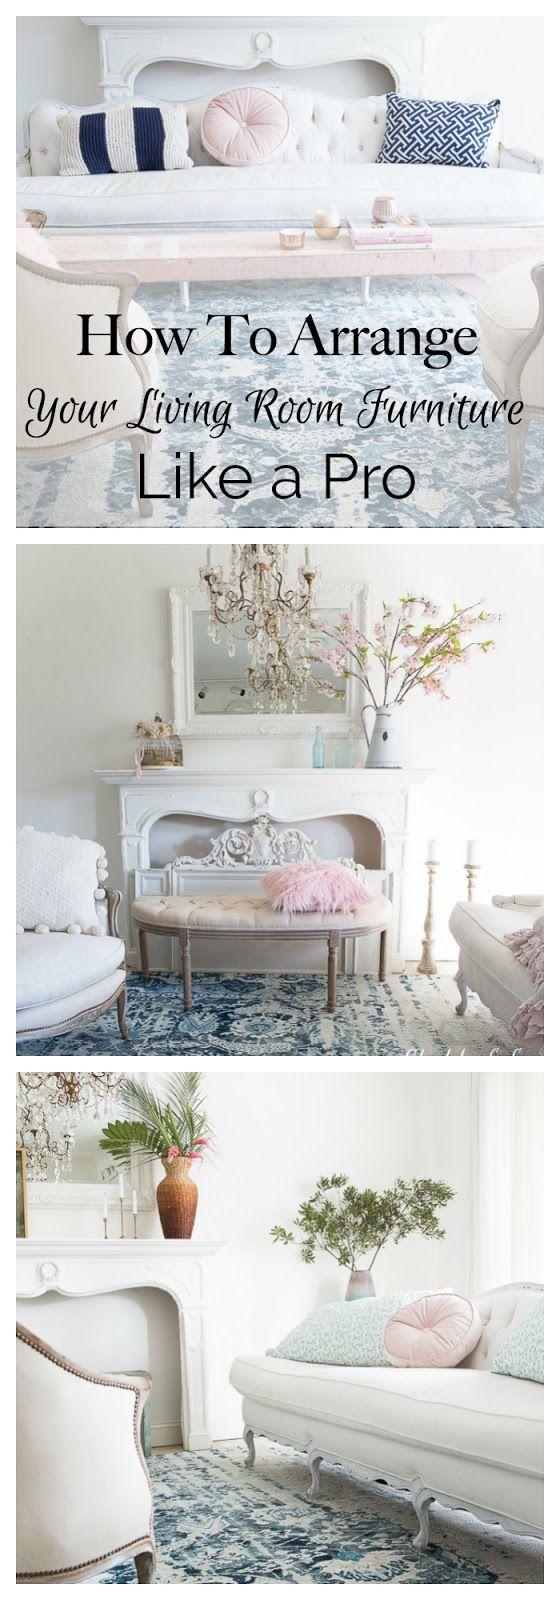 Best 20 arrange furniture ideas on pinterest furniture - Ideas to arrange living room furniture ...